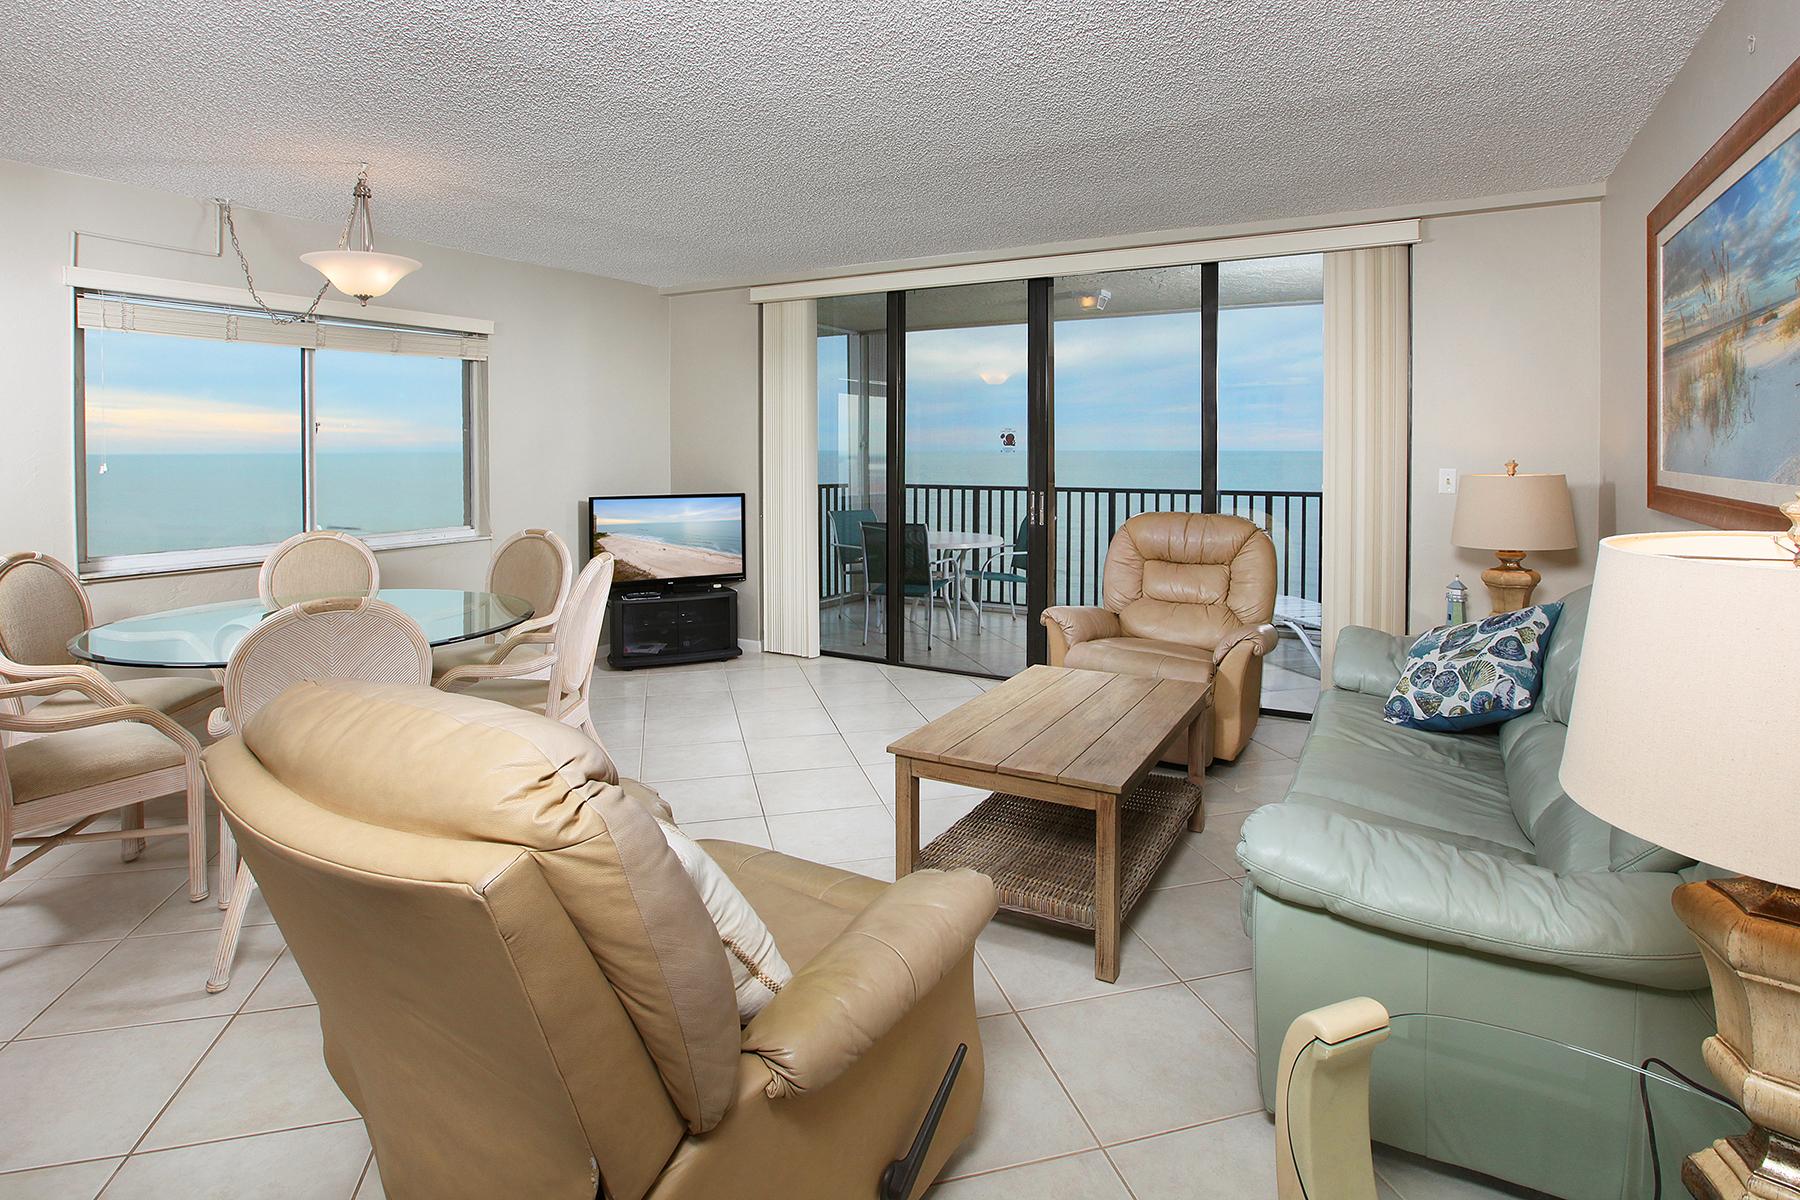 Condomínio para Venda às SEAWINDS - SEAWINDS 890 S Collier Blvd 1701 Marco Island, Florida 34145 Estados Unidos